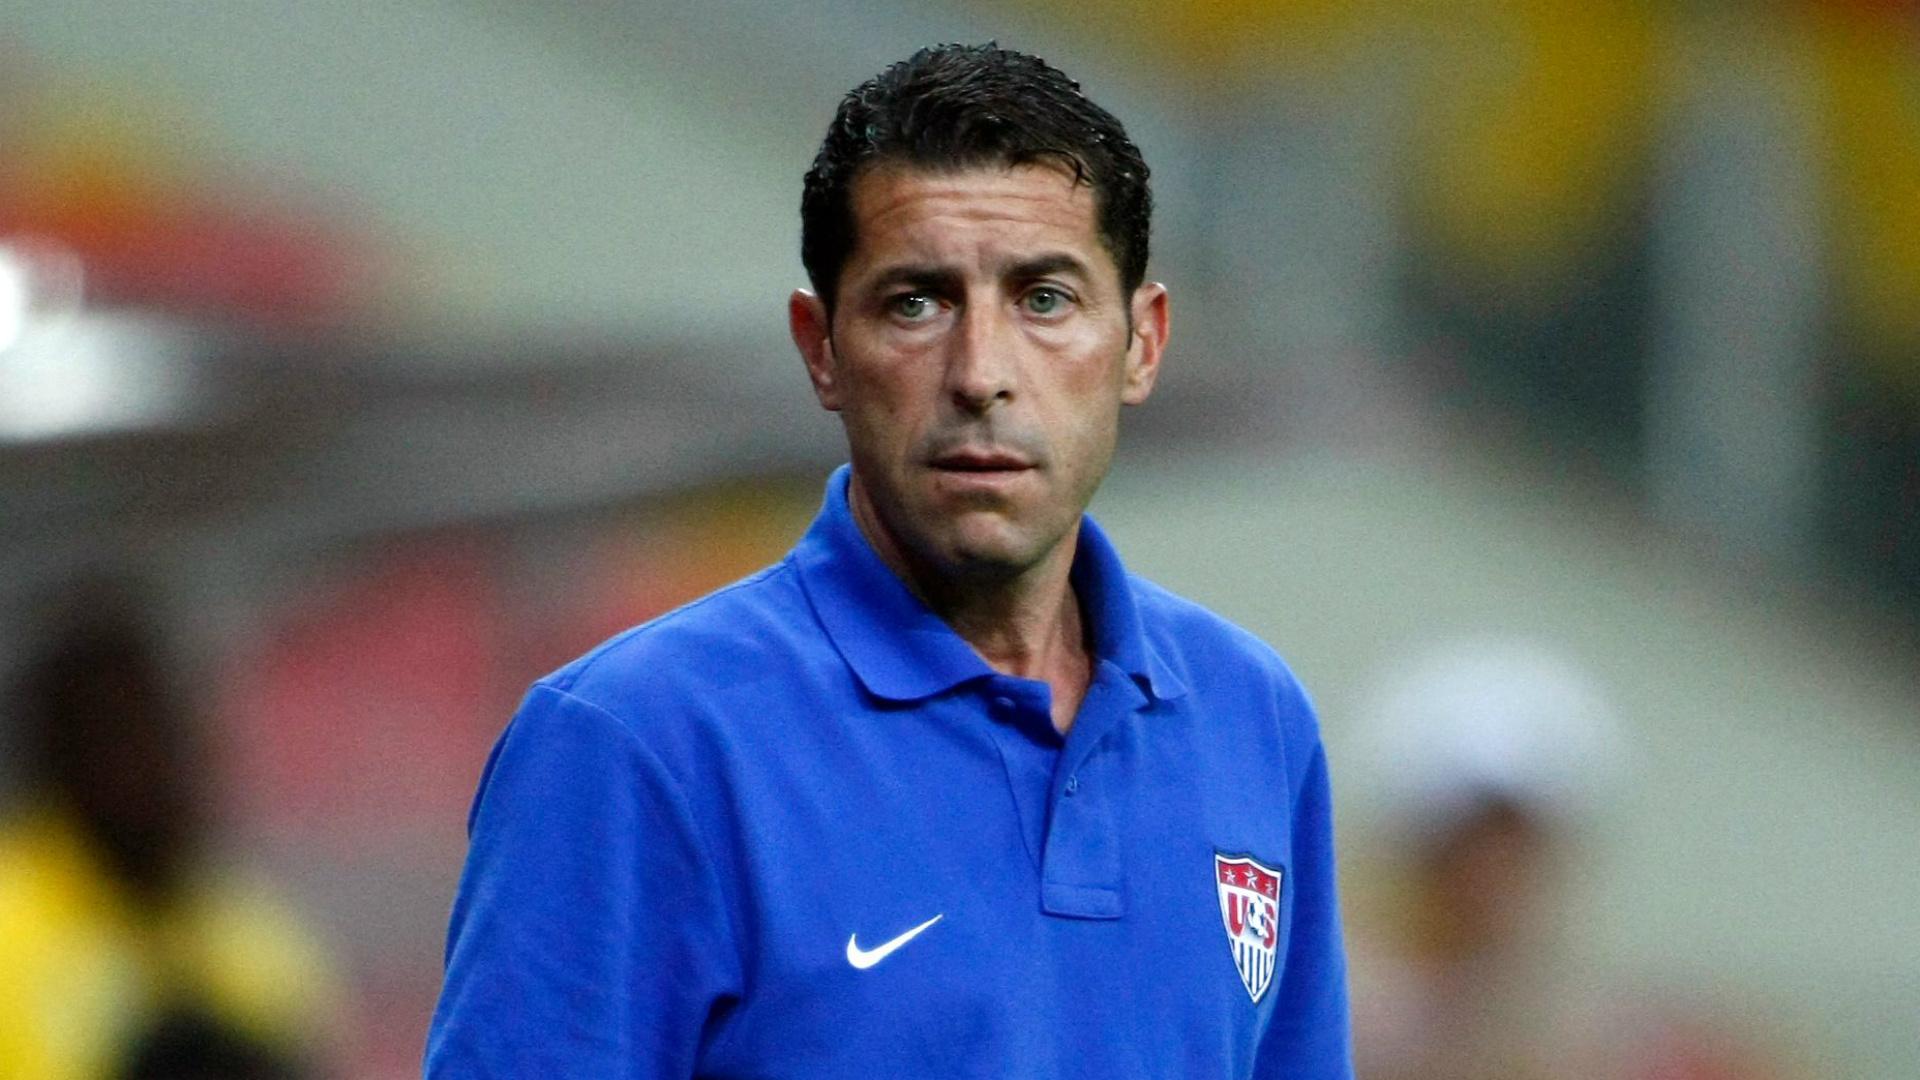 Tab Ramos USA U20 World Cup 0272013